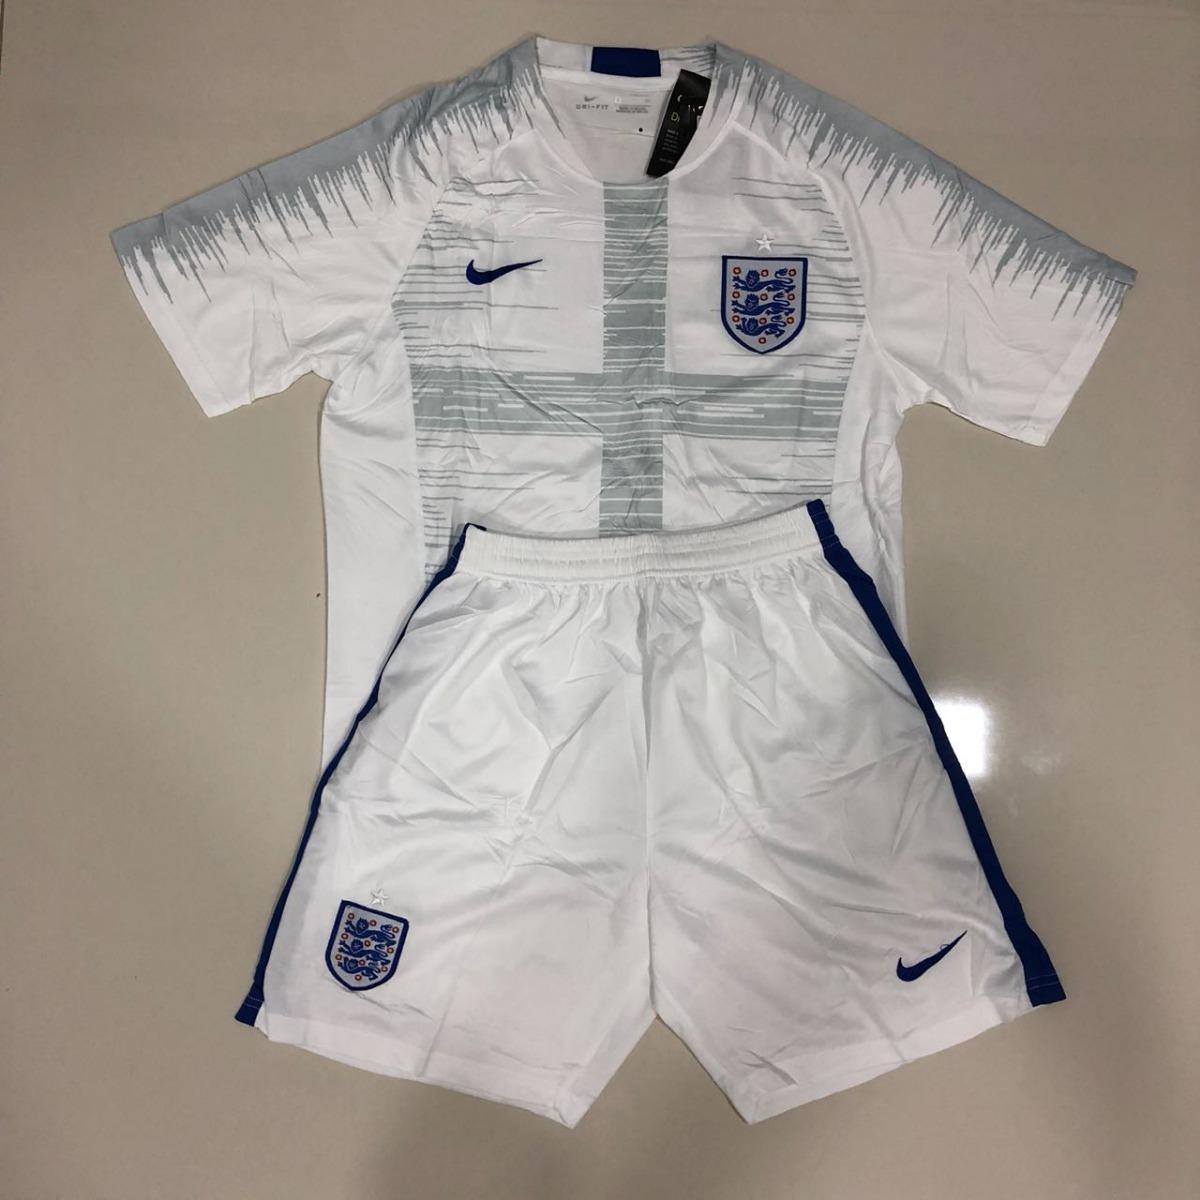 Uniforme Adulto Camisa E Shorts Seleção Inglaterra Copa 2018 - R ... 505ea7039ae2e